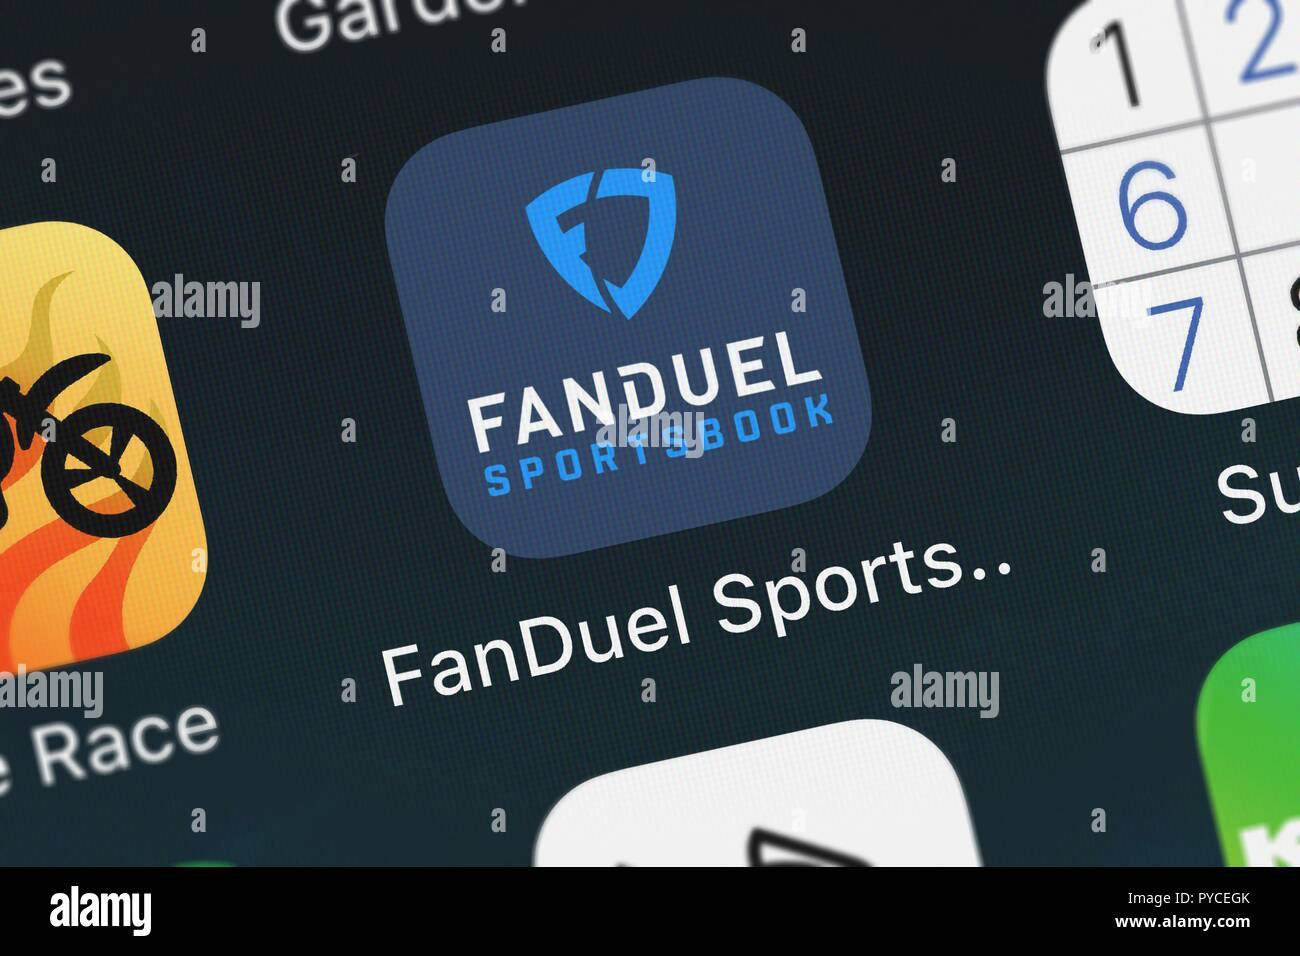 London, United Kingdom - October 26, 2018: Close-up shot of FanDuel, Inc.'s popular app FanDuel Sportsbook. Stock Photo